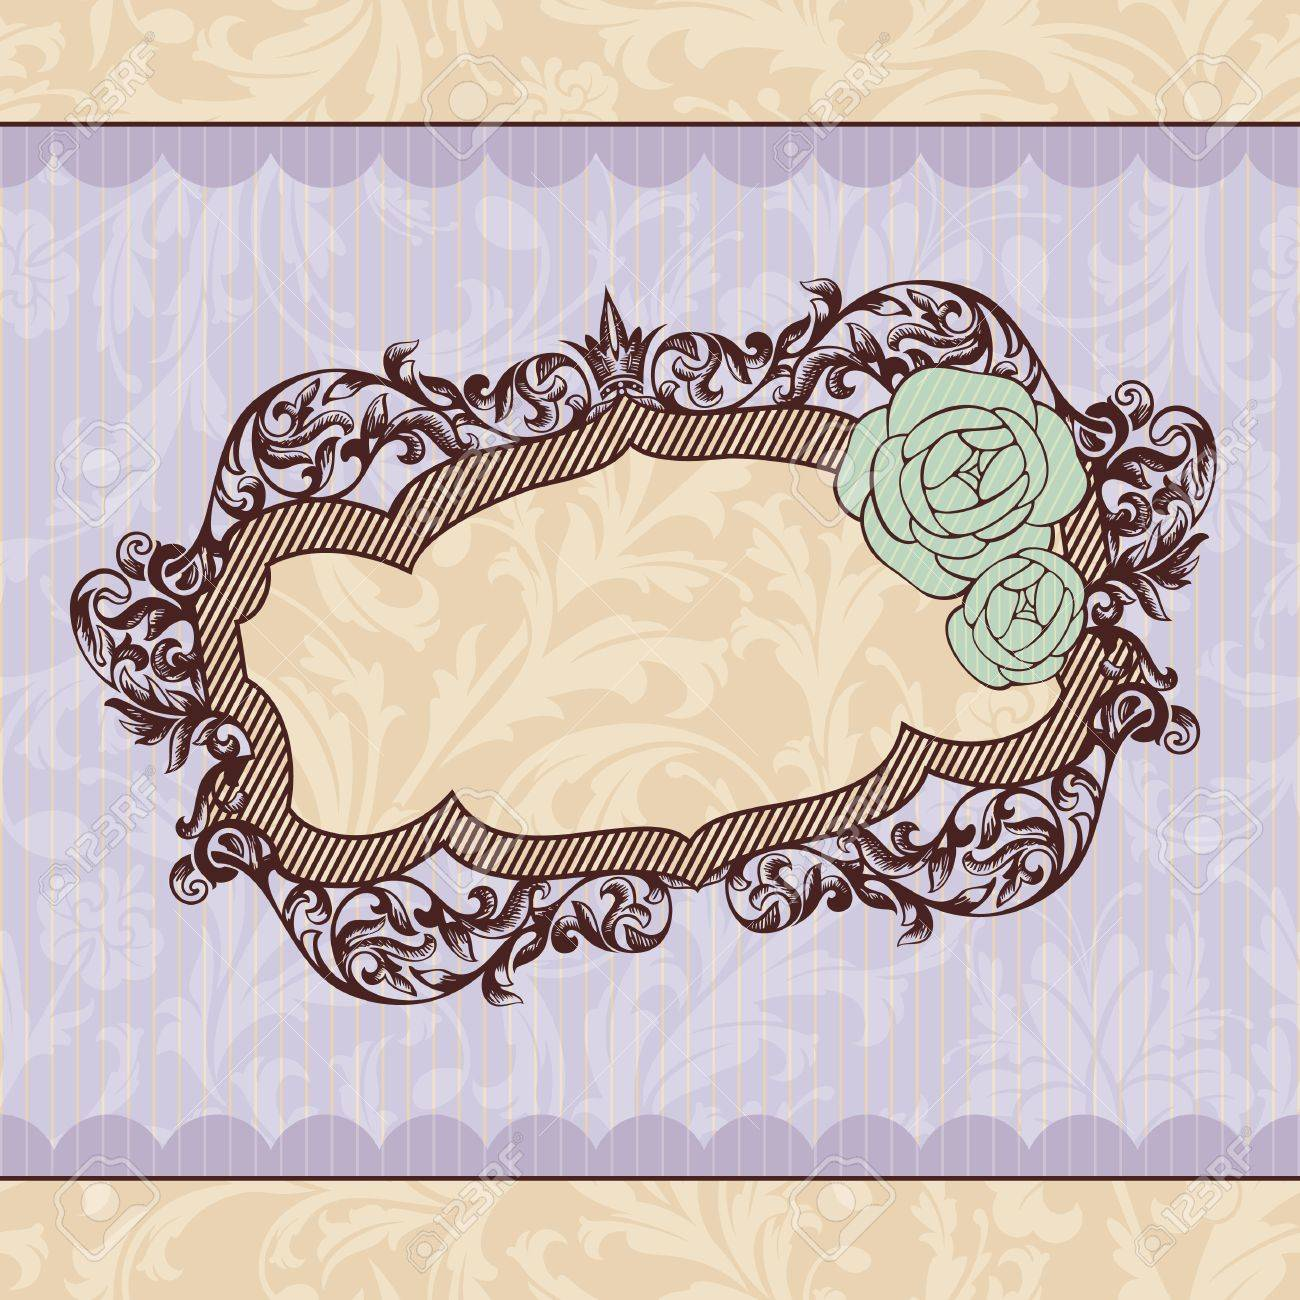 abstract royal ornate vintage frame vector illustration Stock Vector - 10533924